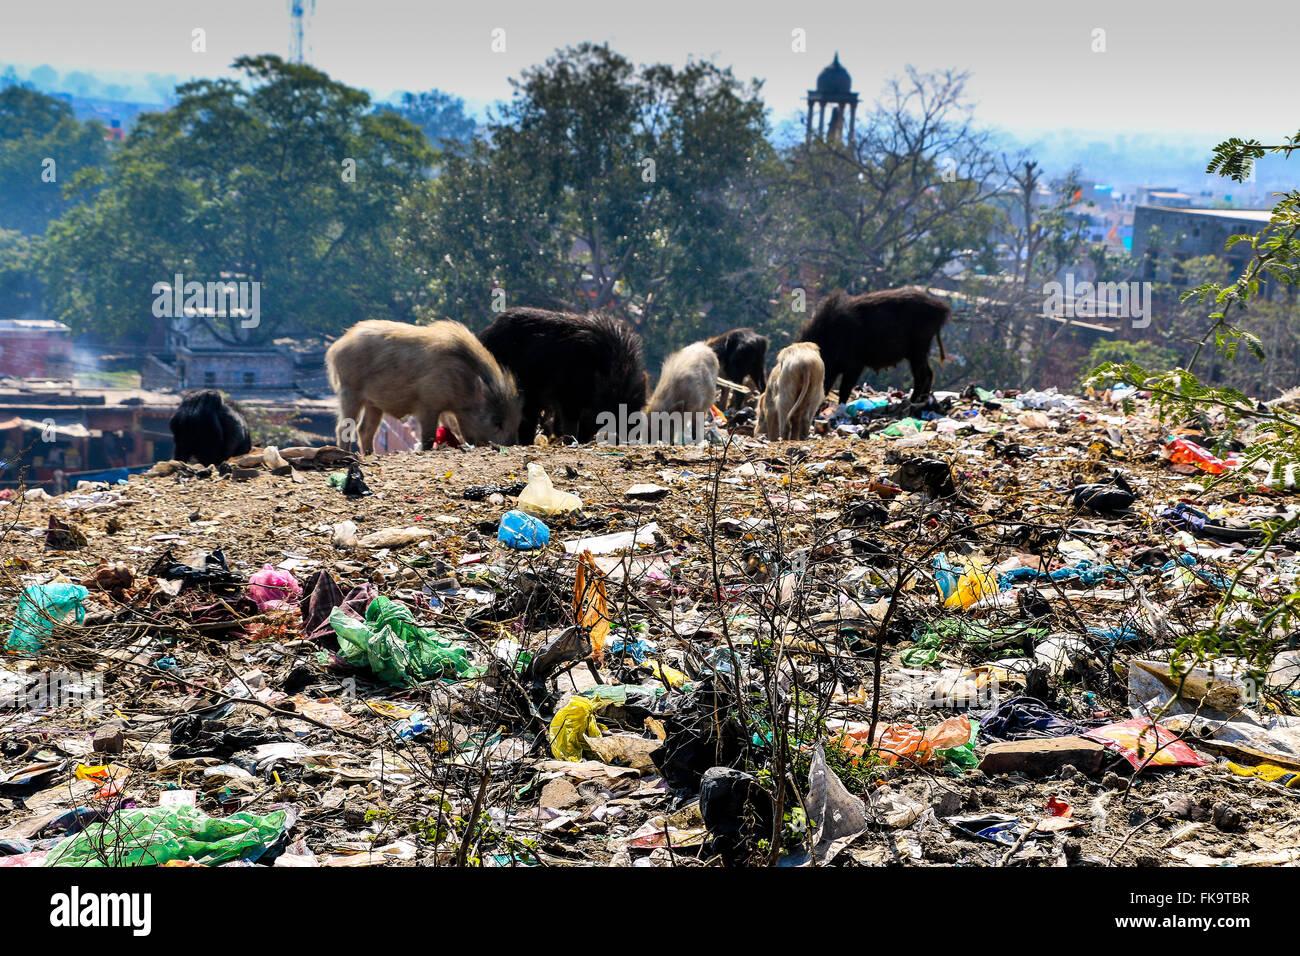 Pigs eating rubbish on rubbish tip  close to  Fatehpur Sikri, UNESCO World Heritage Site, Uttar Pradesh, India, - Stock Image